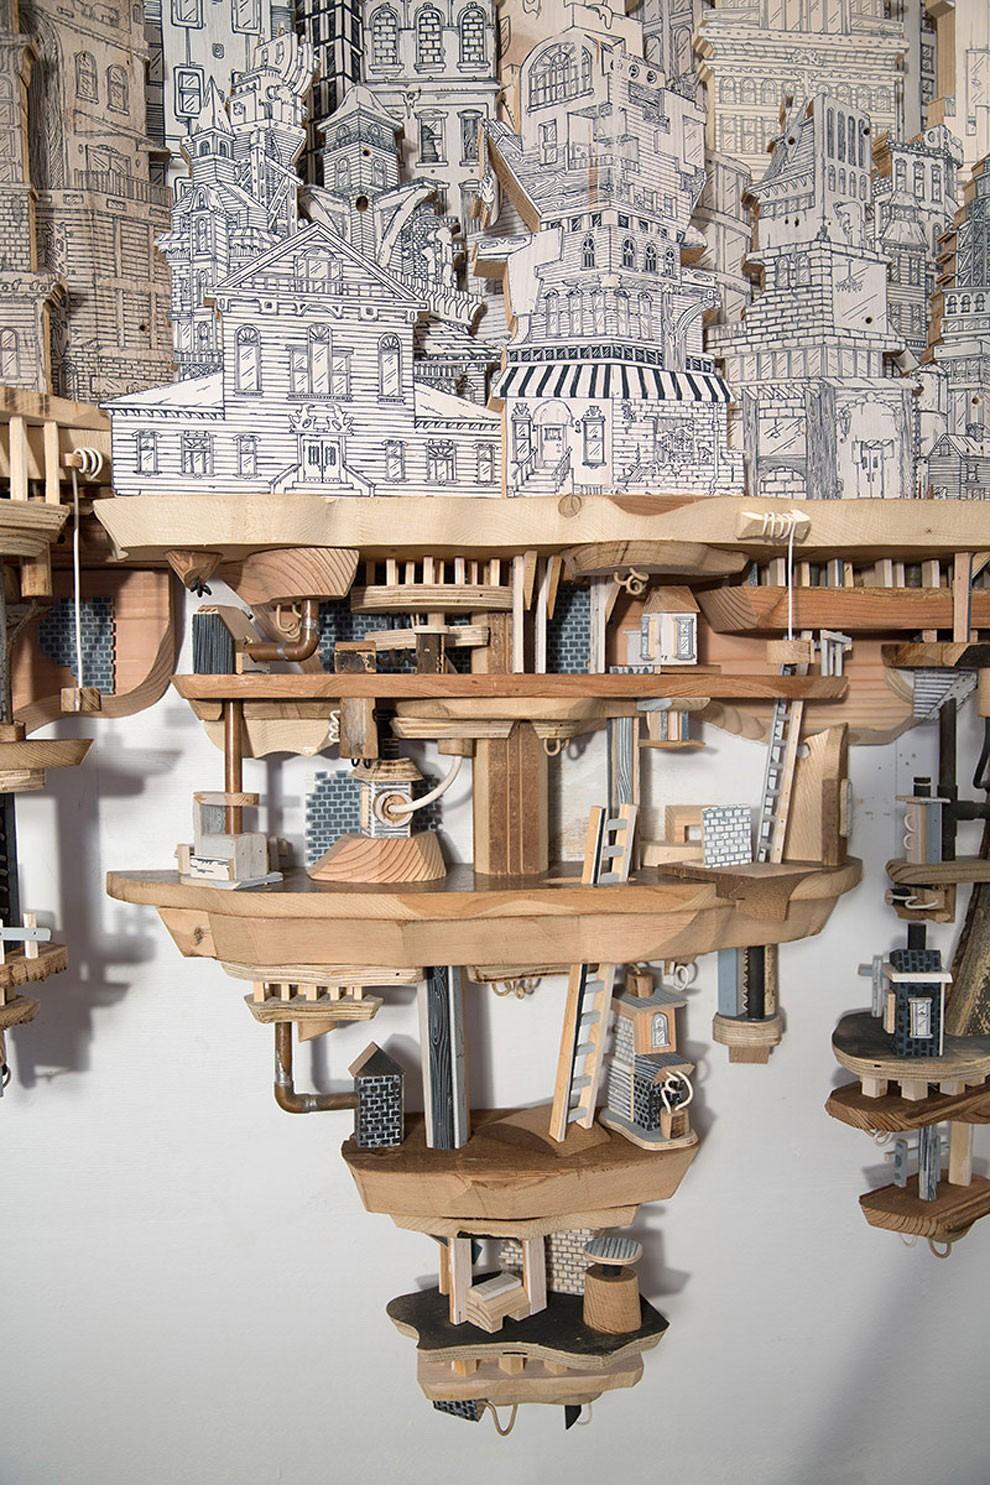 illustrazioni-scultura-mondi-miniatura-architettura-luke-o-sullivan-06